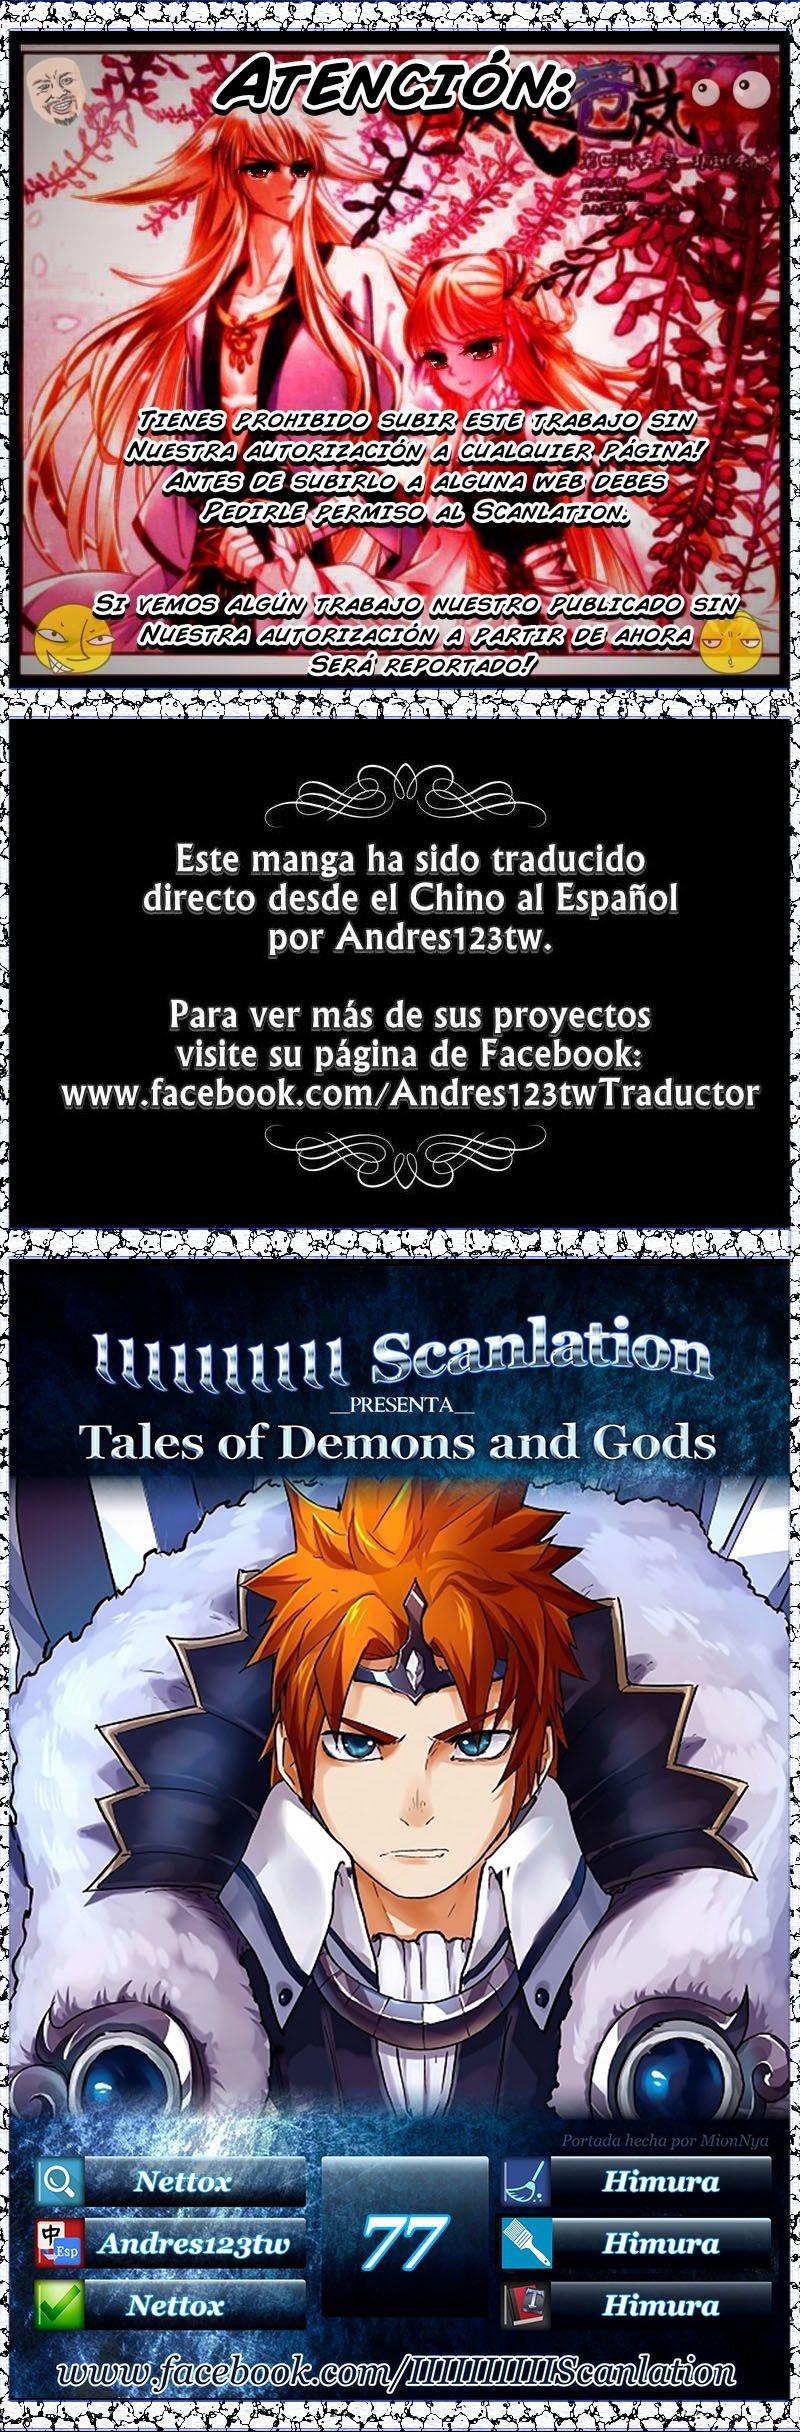 http://c5.ninemanga.com/es_manga/7/17735/461460/ef7141e5a52641b0941128fcbbde8a27.jpg Page 1